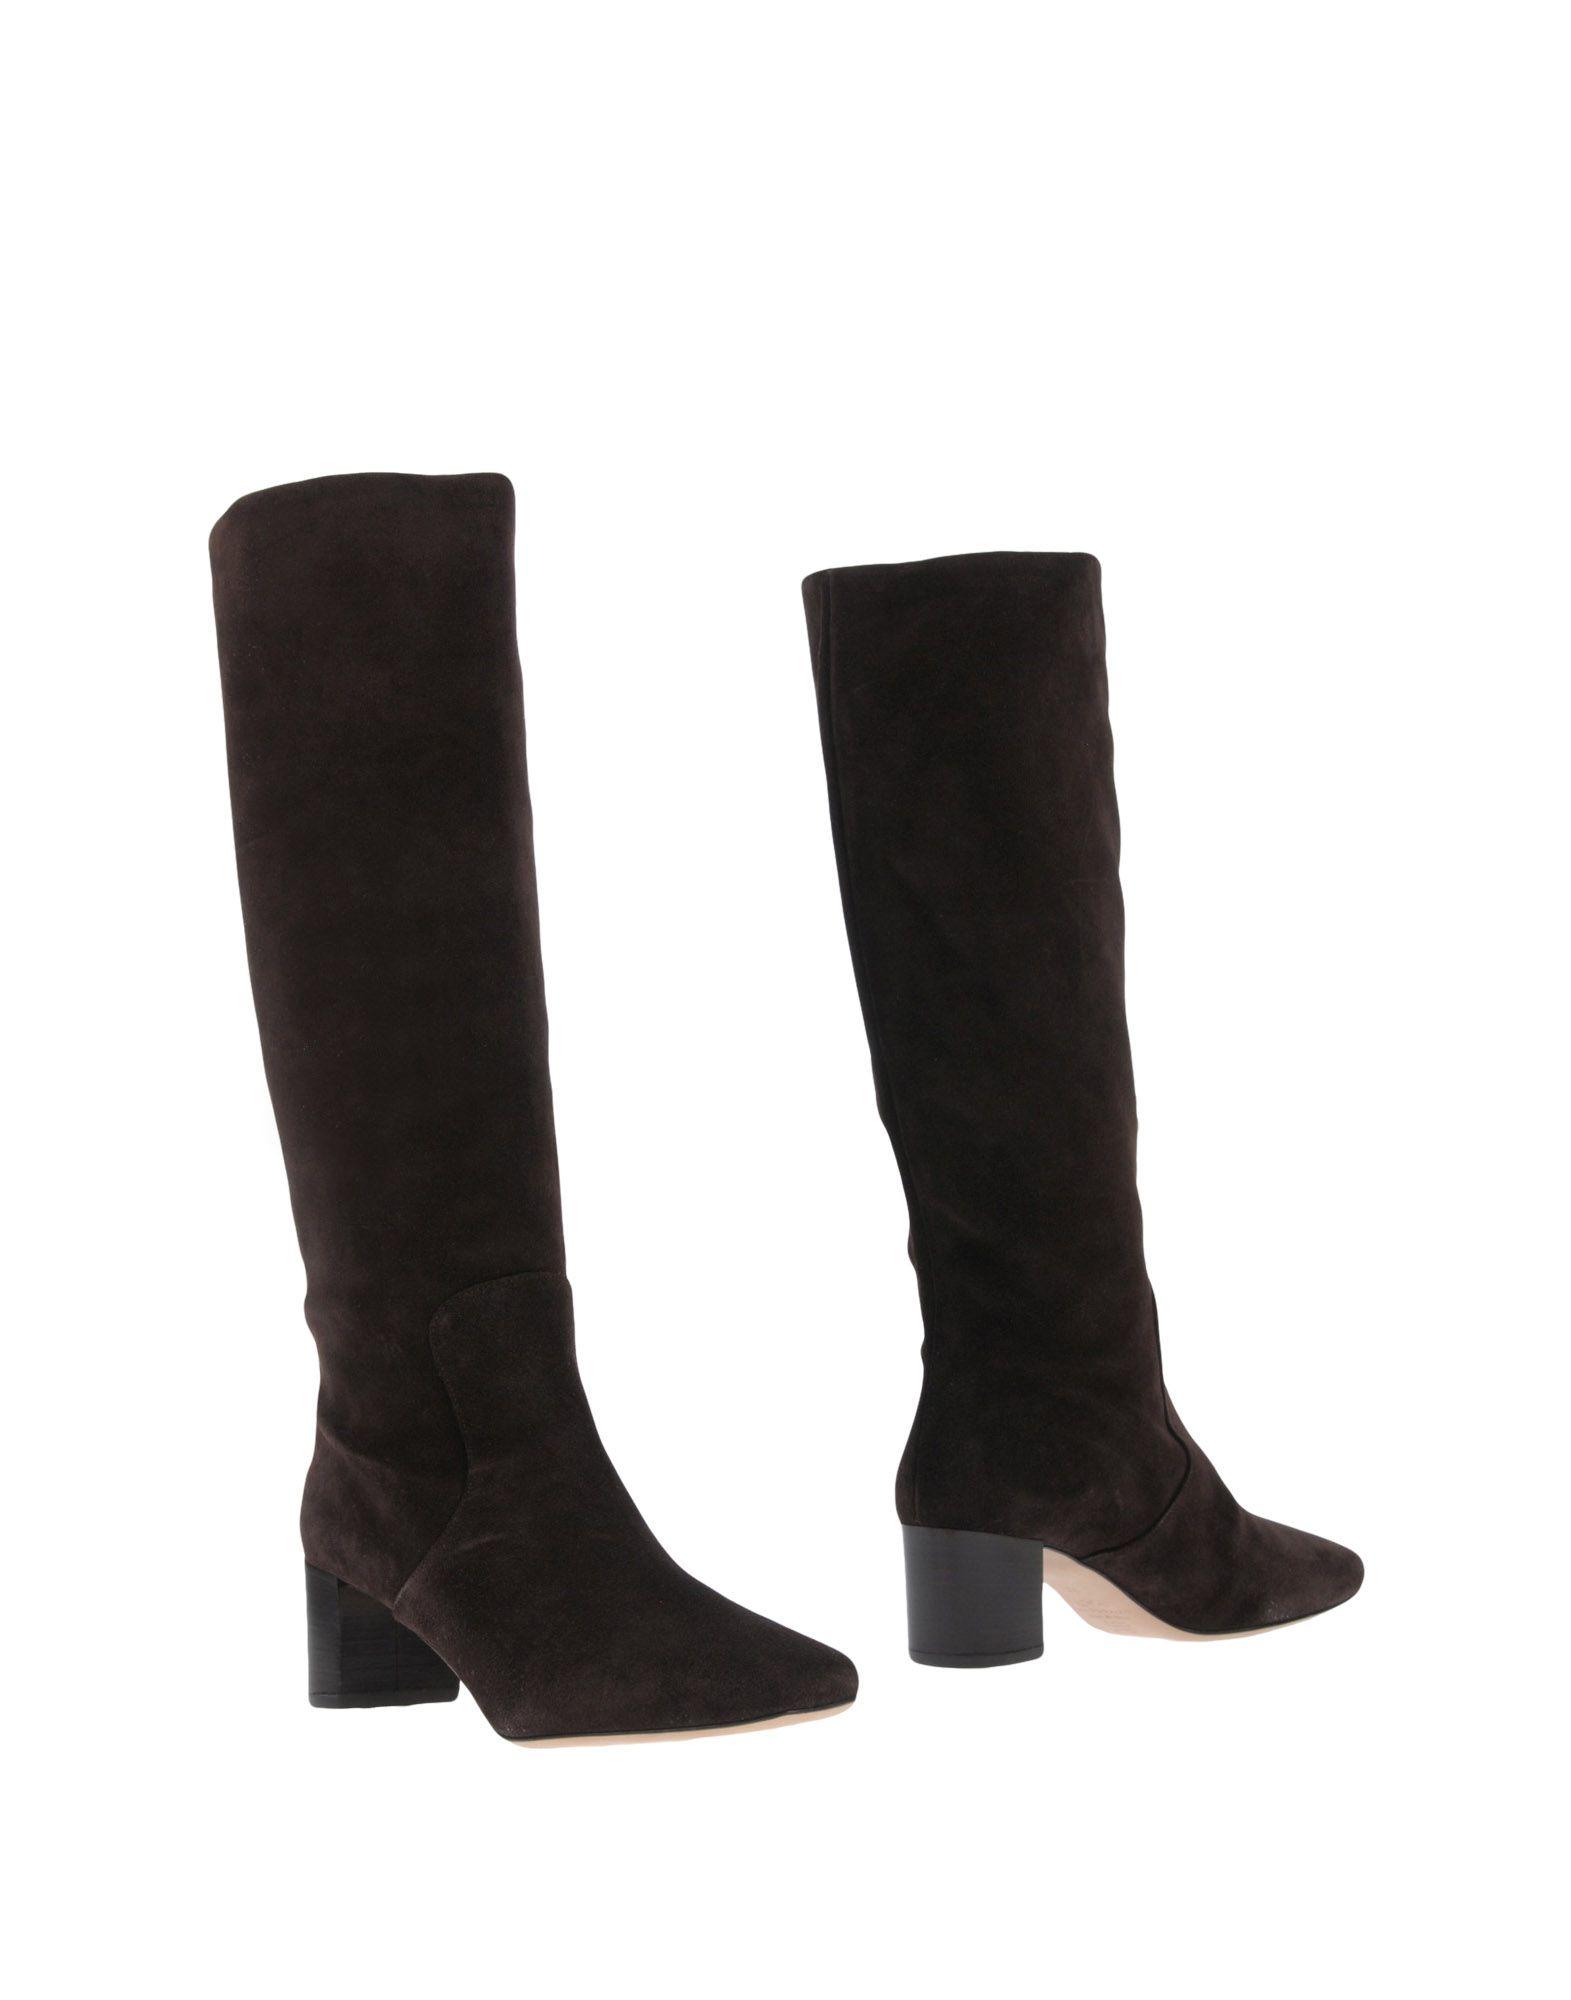 Haltbare Mode billige Schuhe Cavallini Stiefel Damen  11455125DA Heiße Schuhe